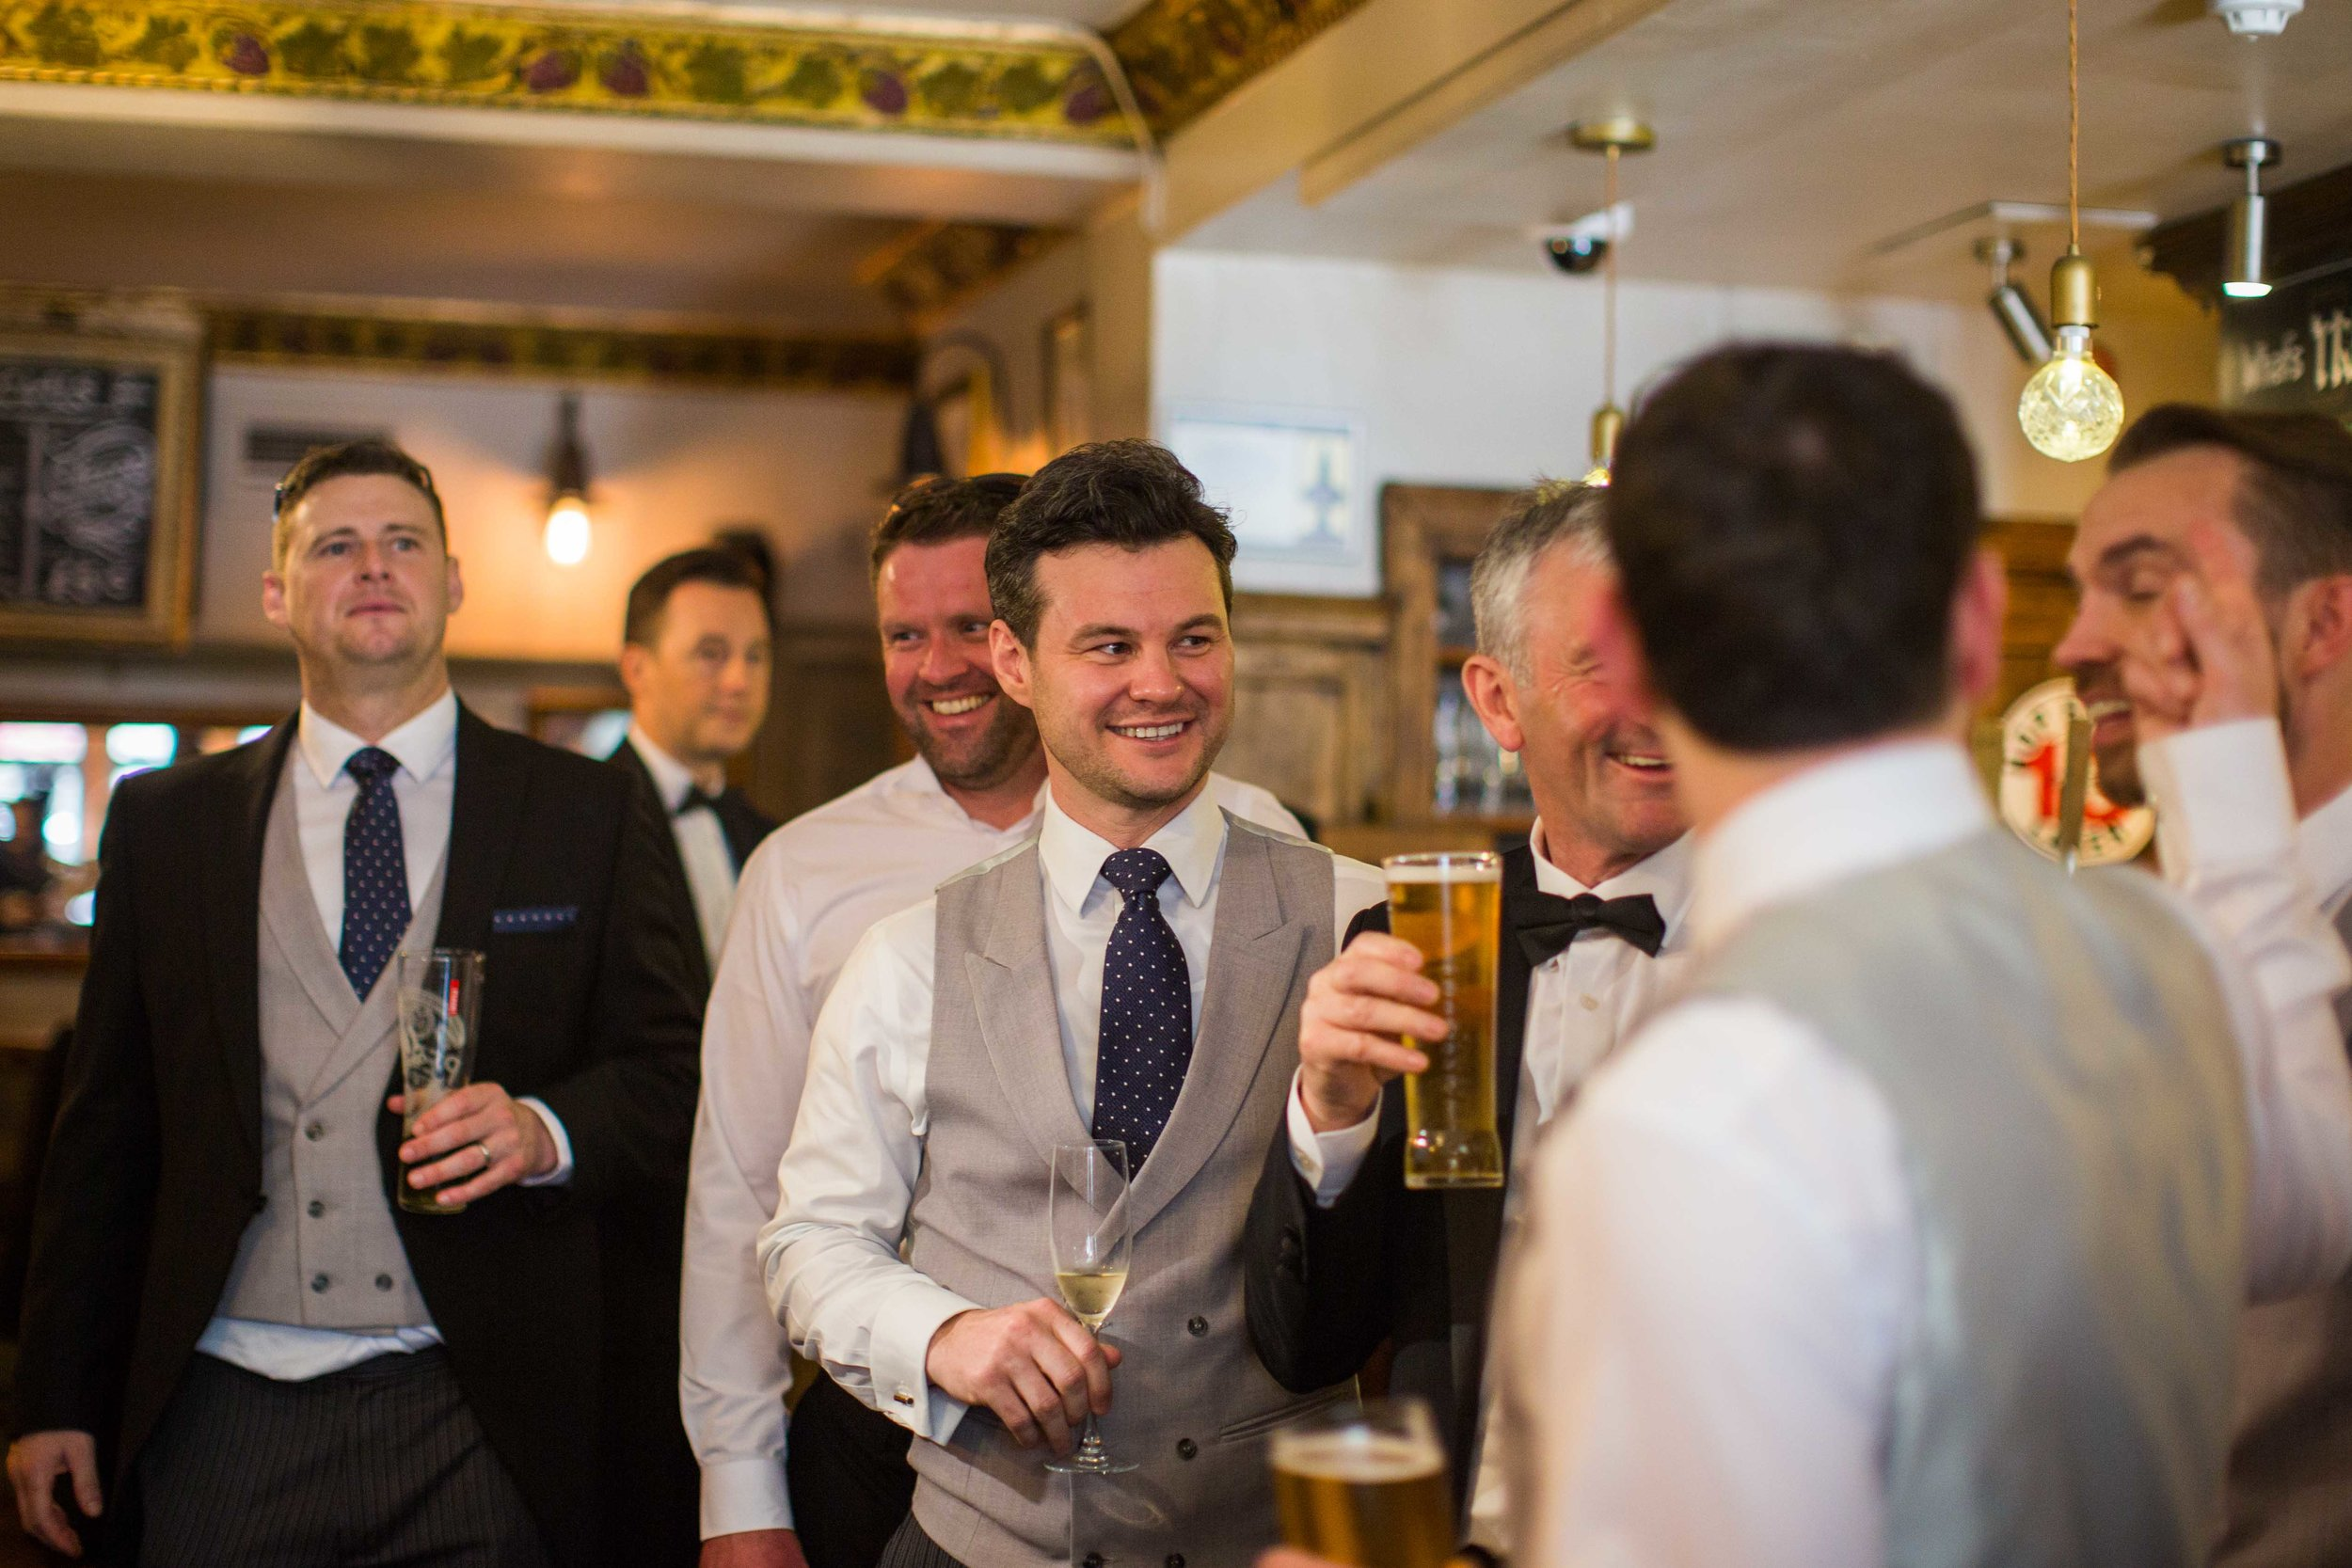 claridges-hotel-wedding-photographer-london-mayfair-natalia-smith-photography-42.jpg